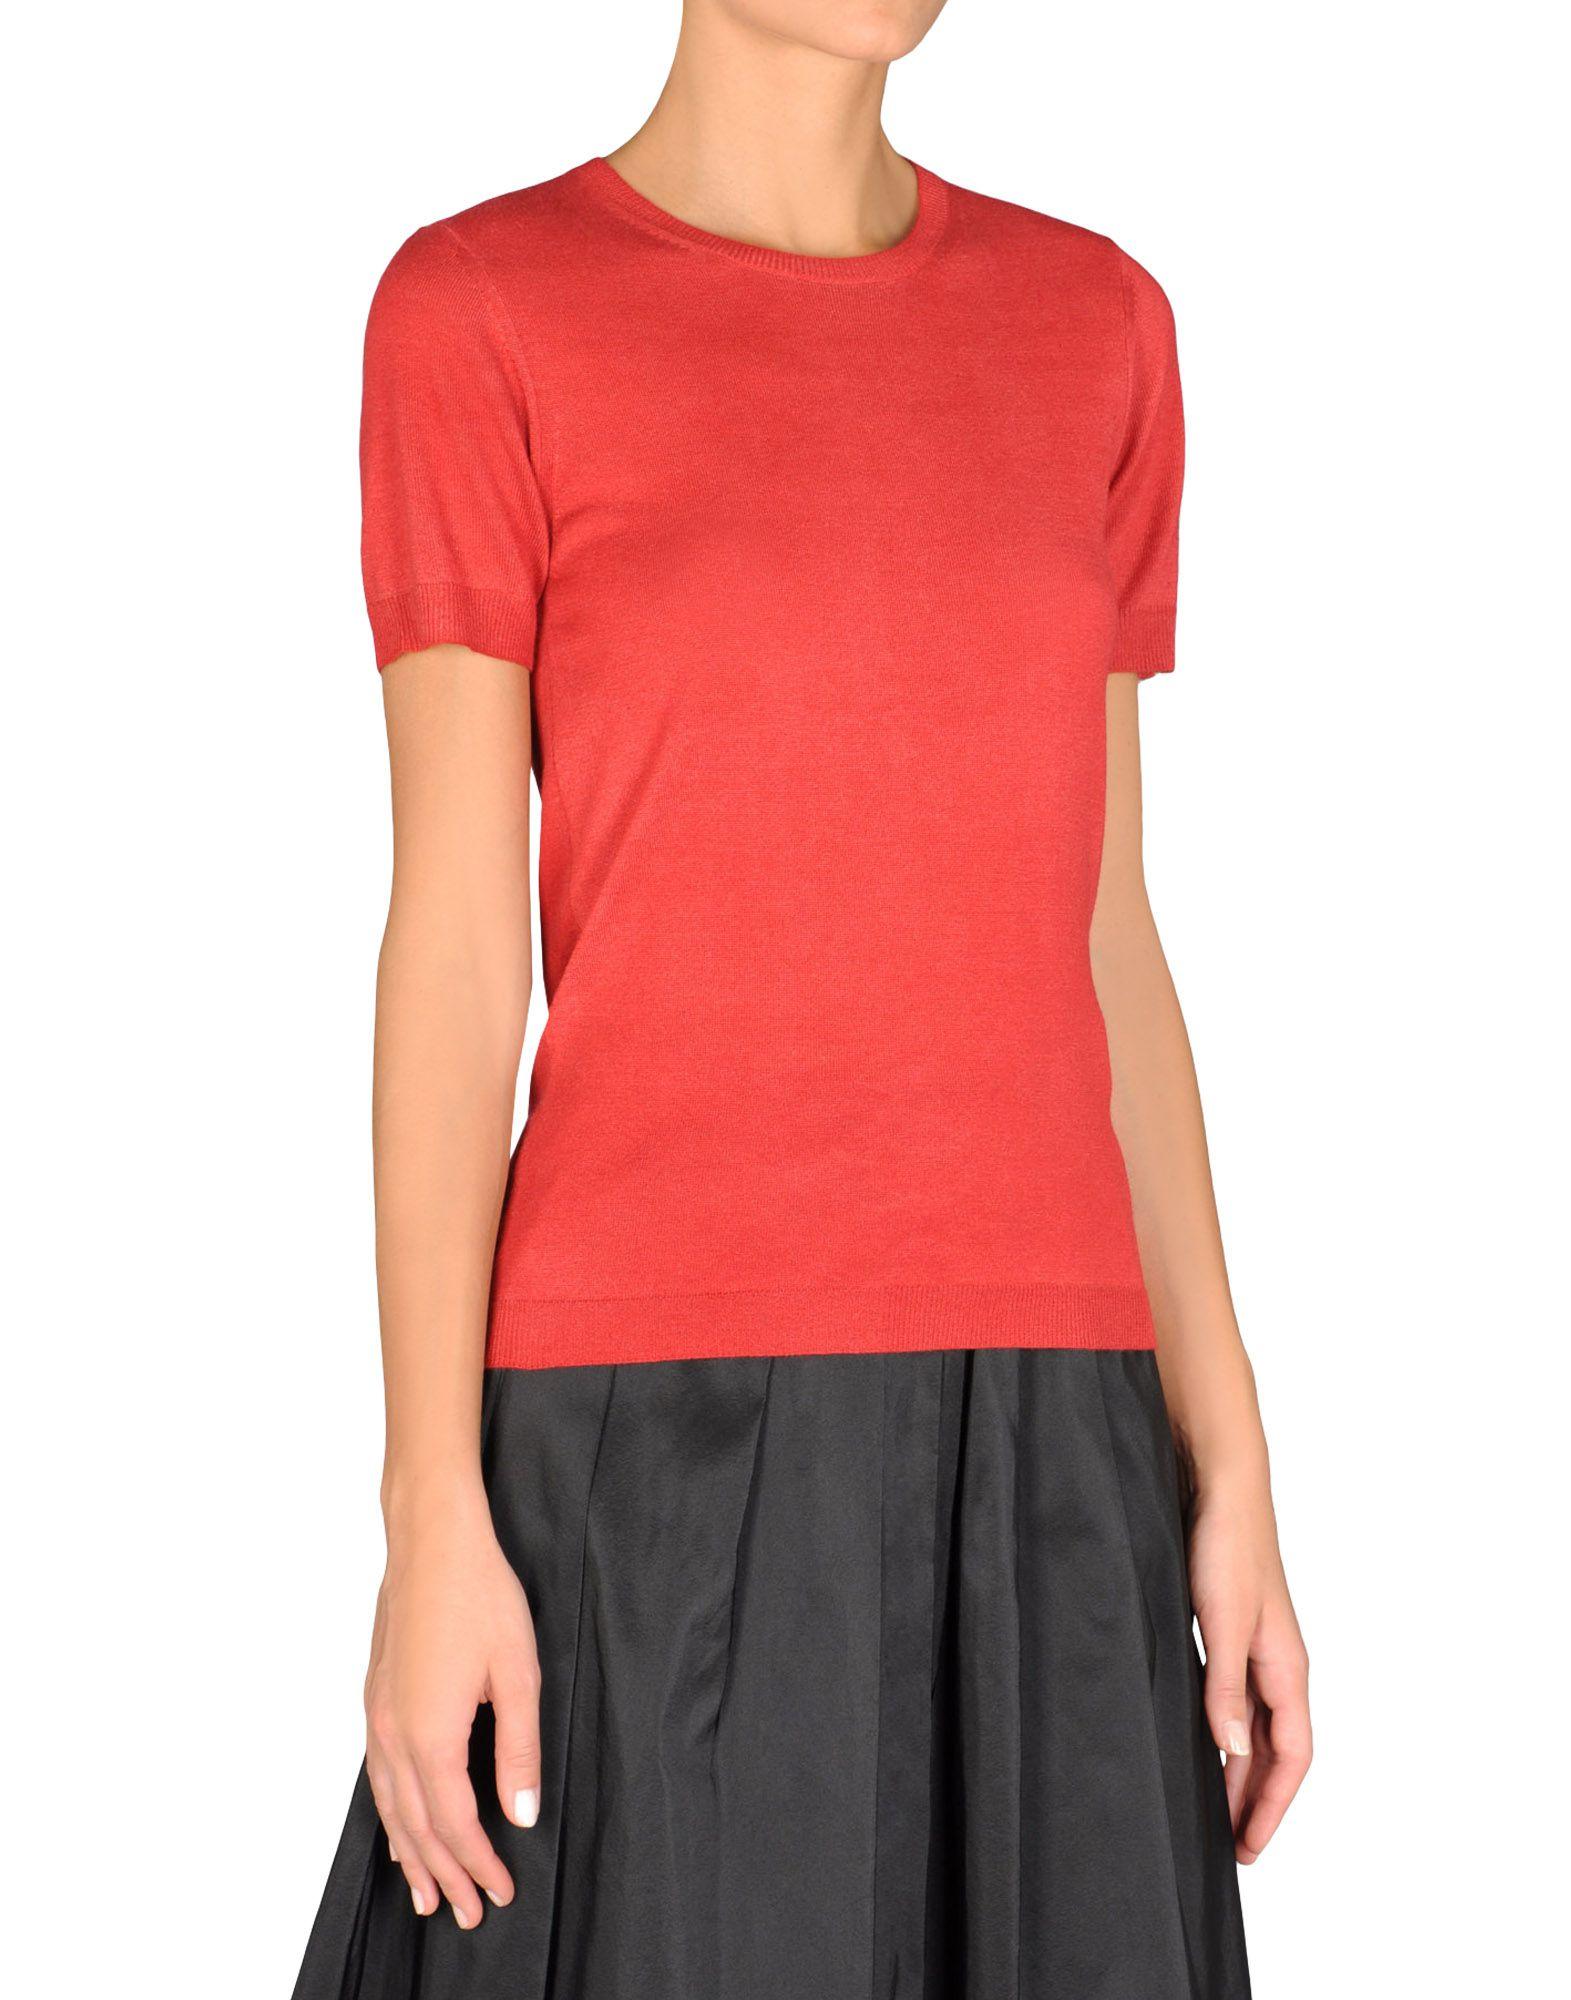 Sweater - JIL SANDER NAVY Online Store